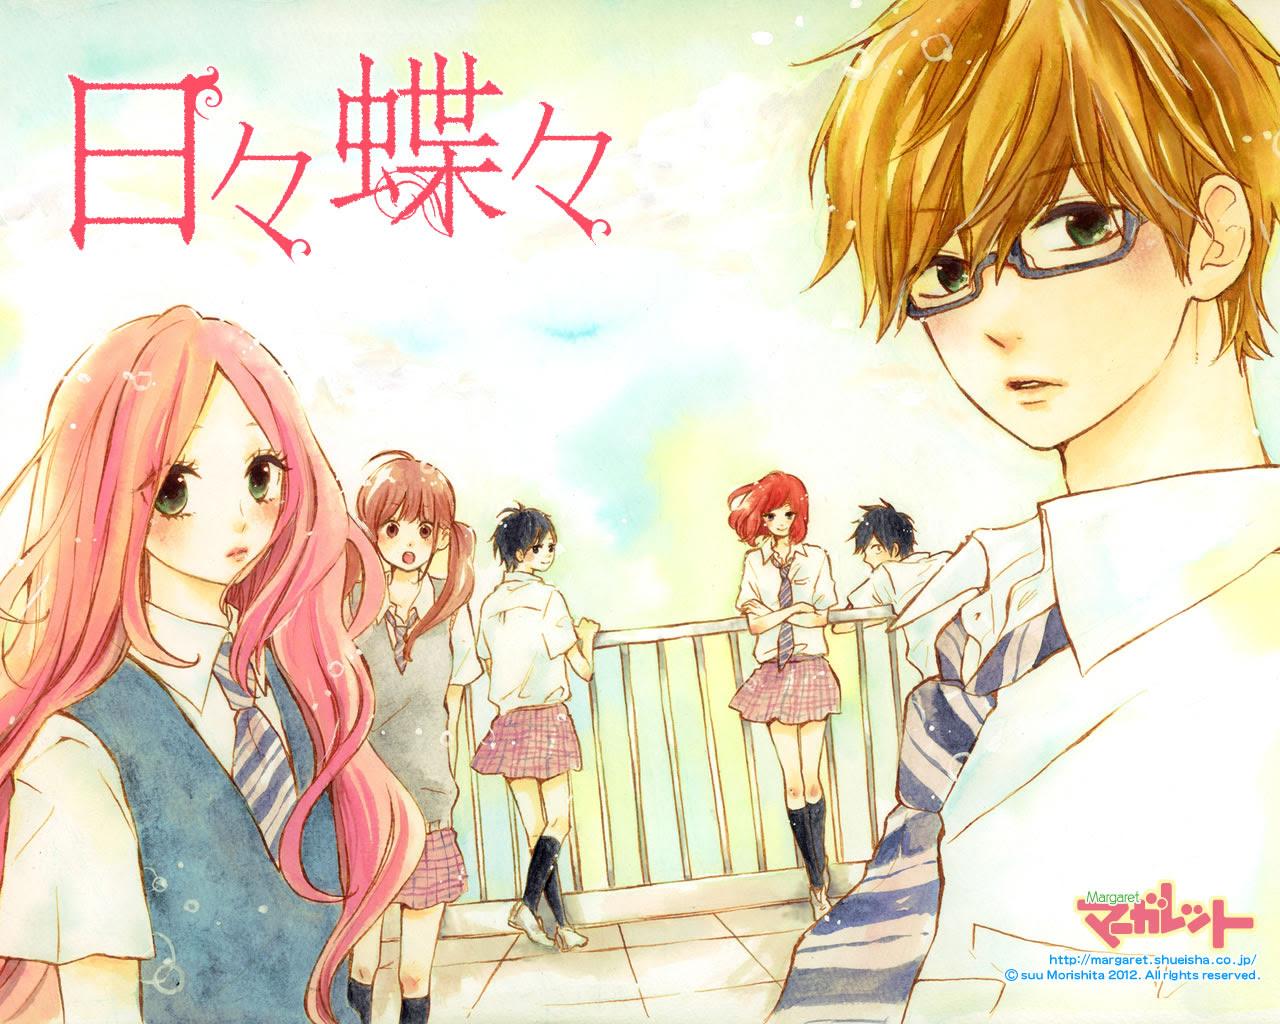 Shoujo Wallpapers For July 2012 Heart Of Manga